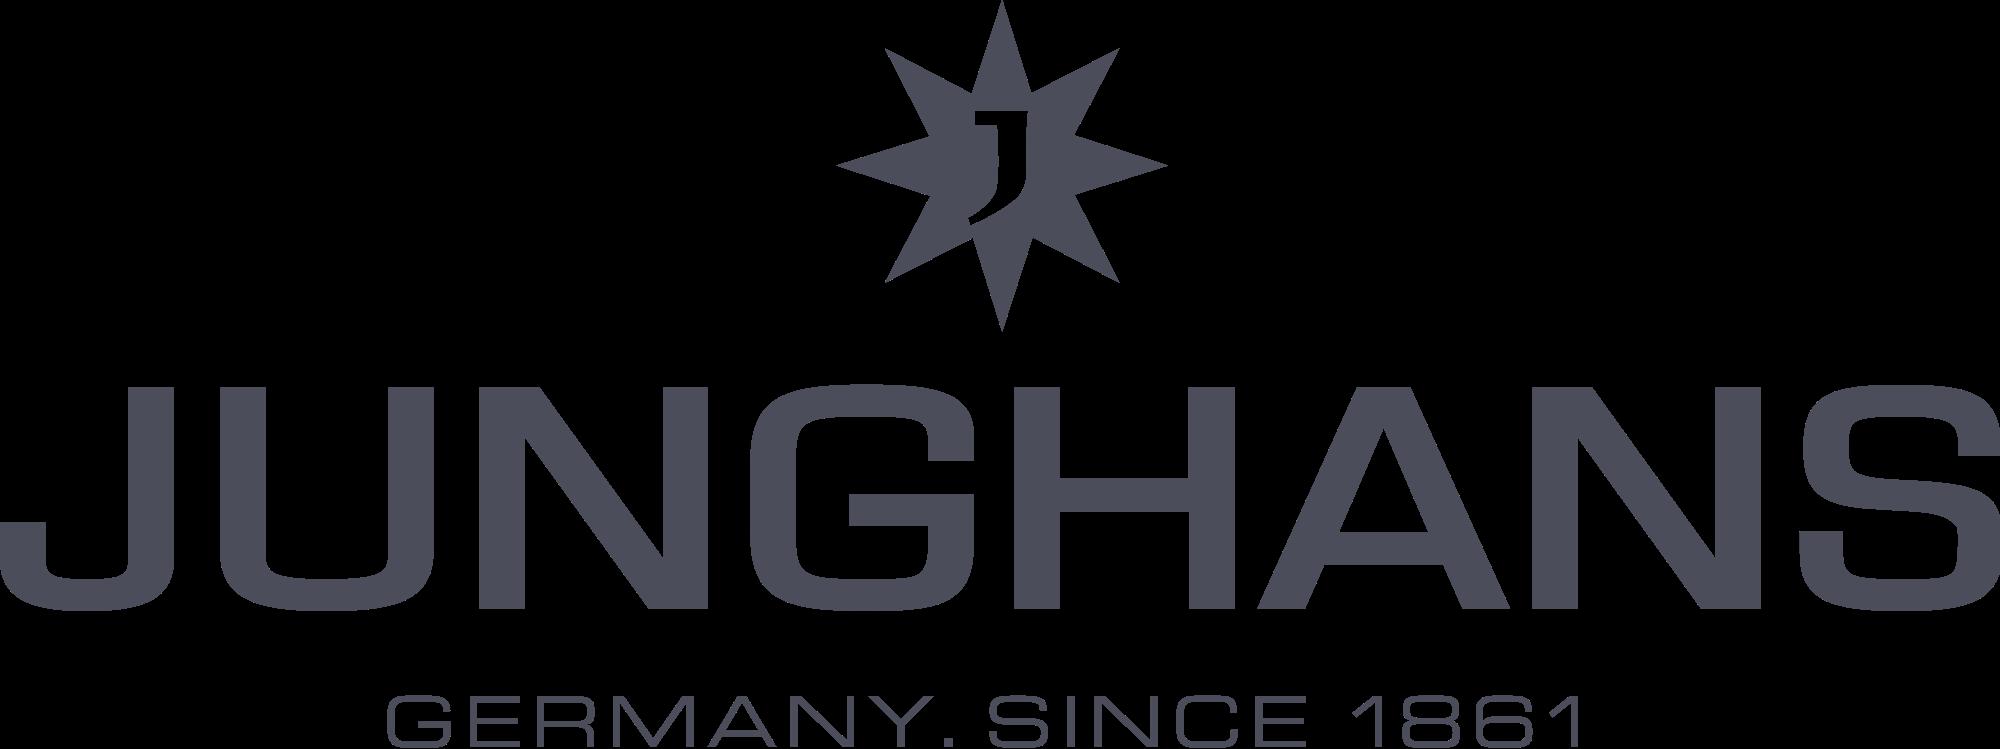 Junghans_logo.png